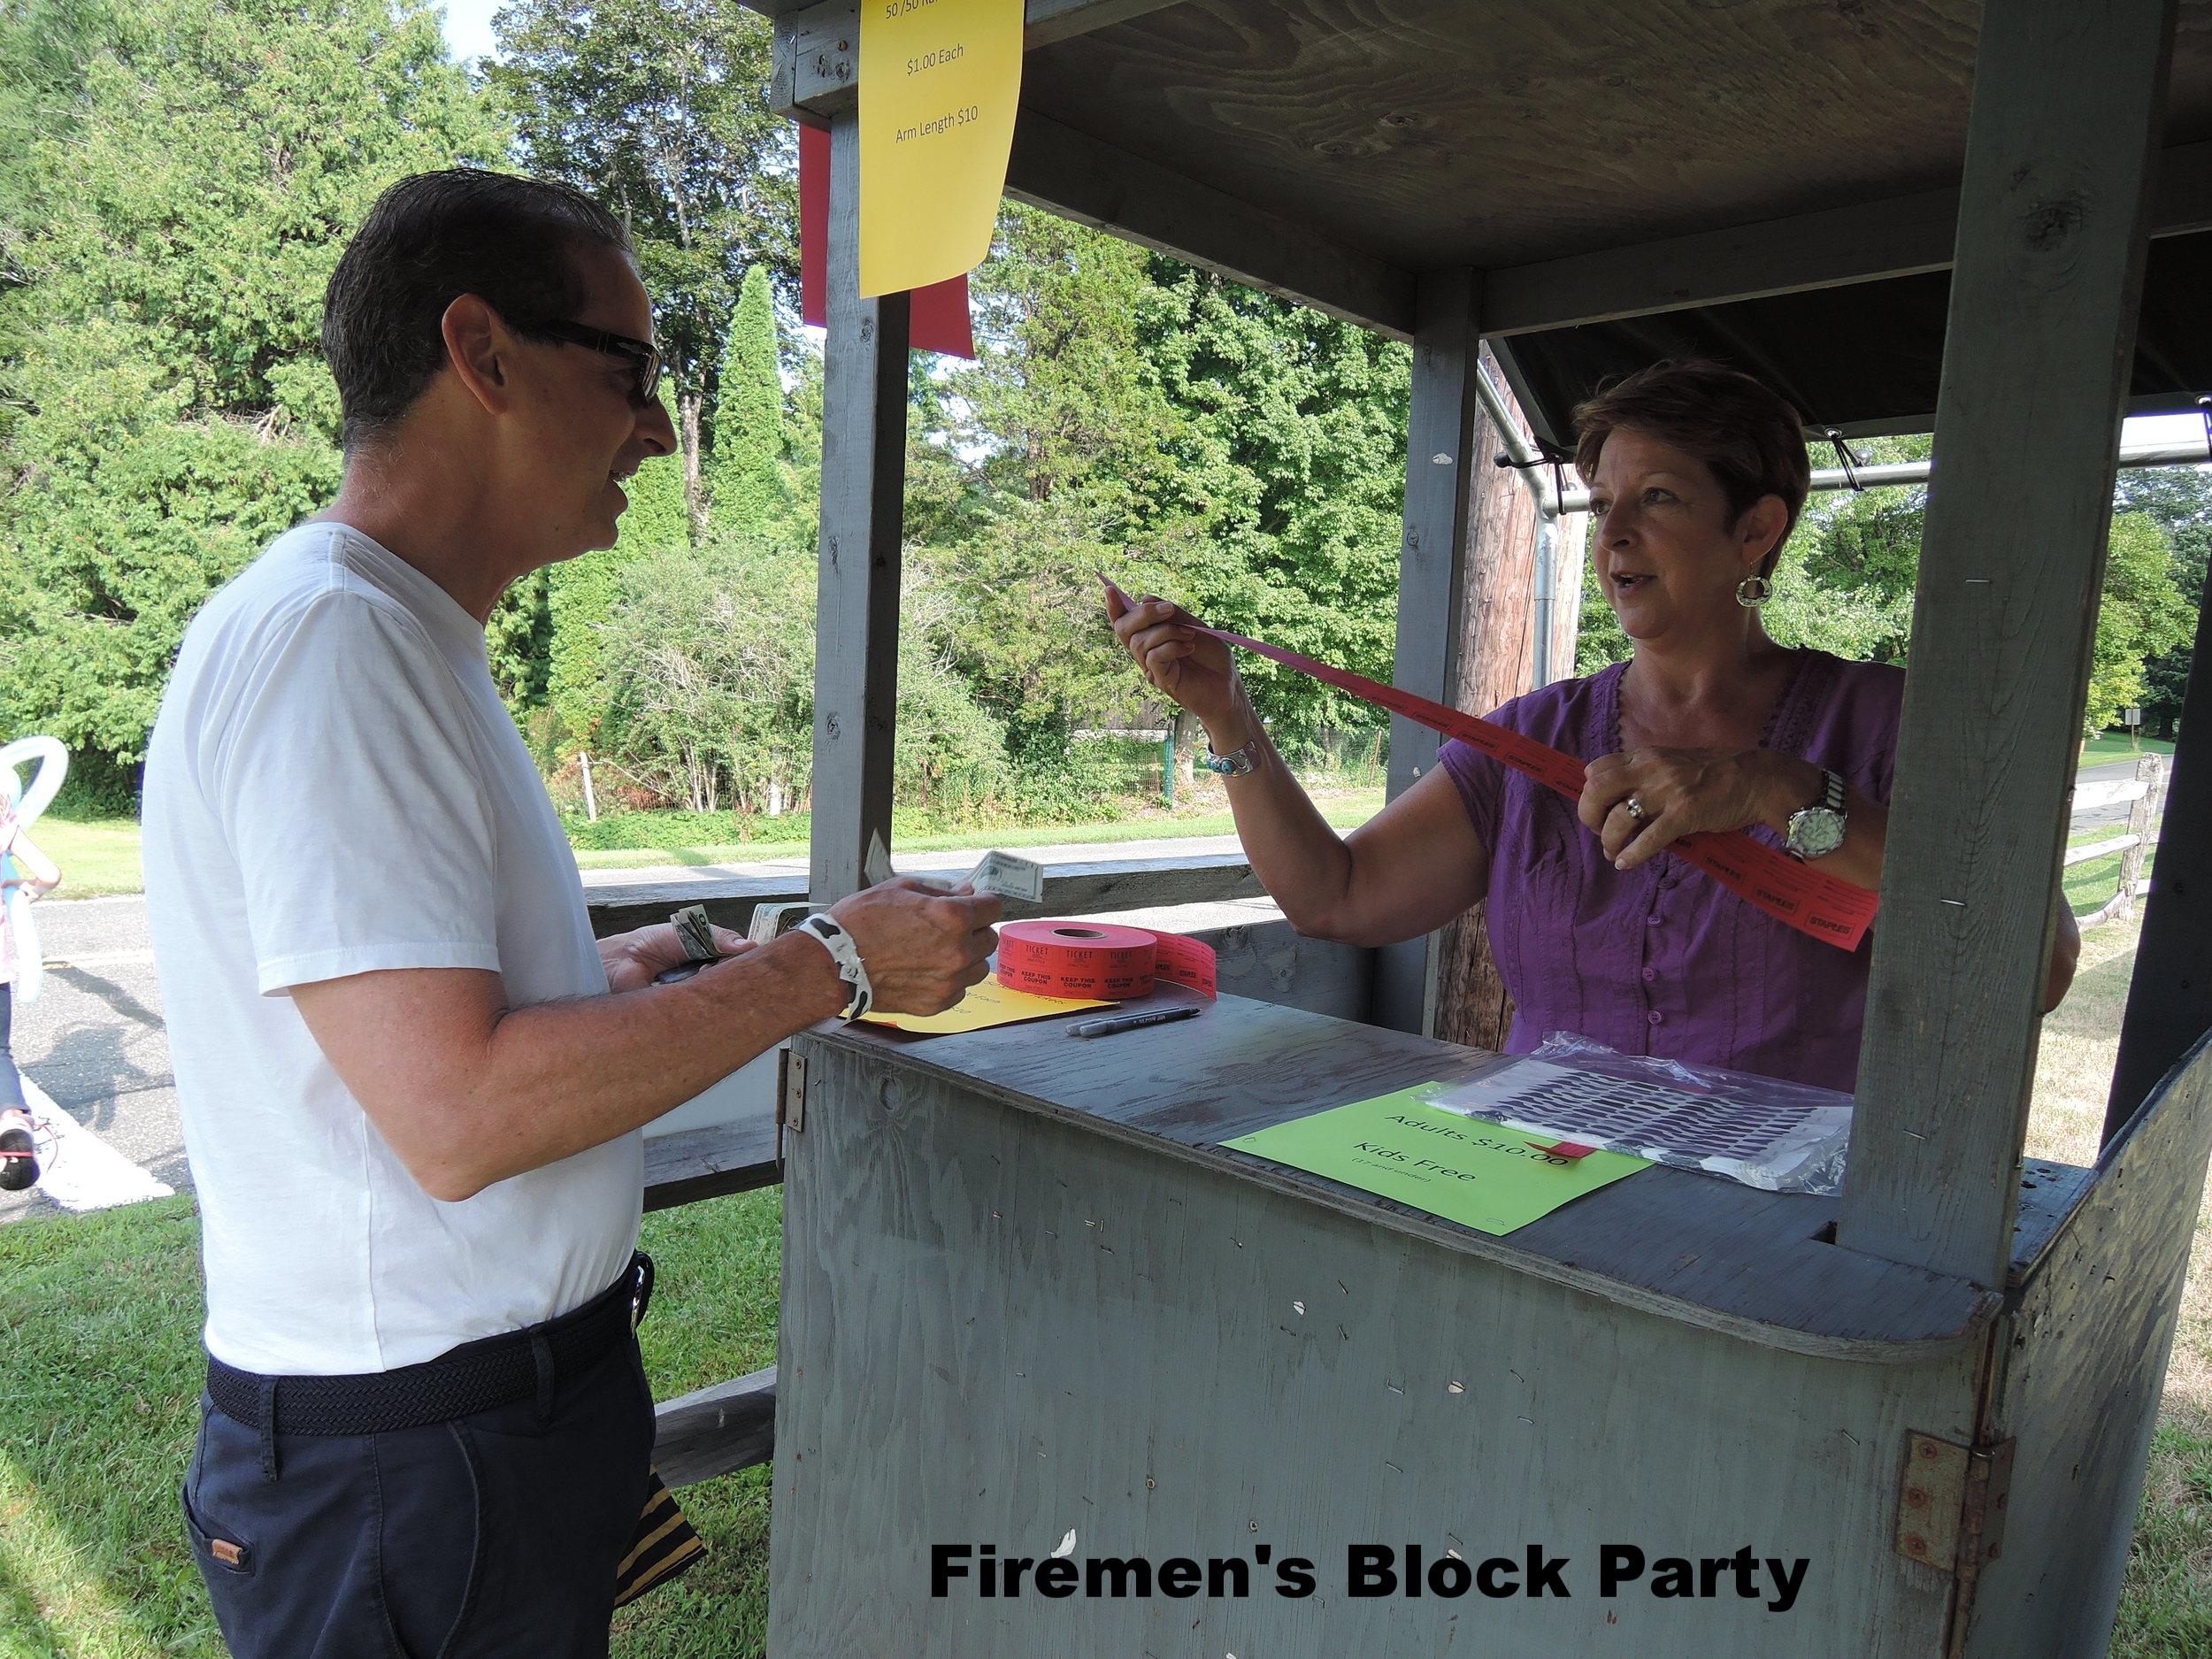 Firemen's Block Party